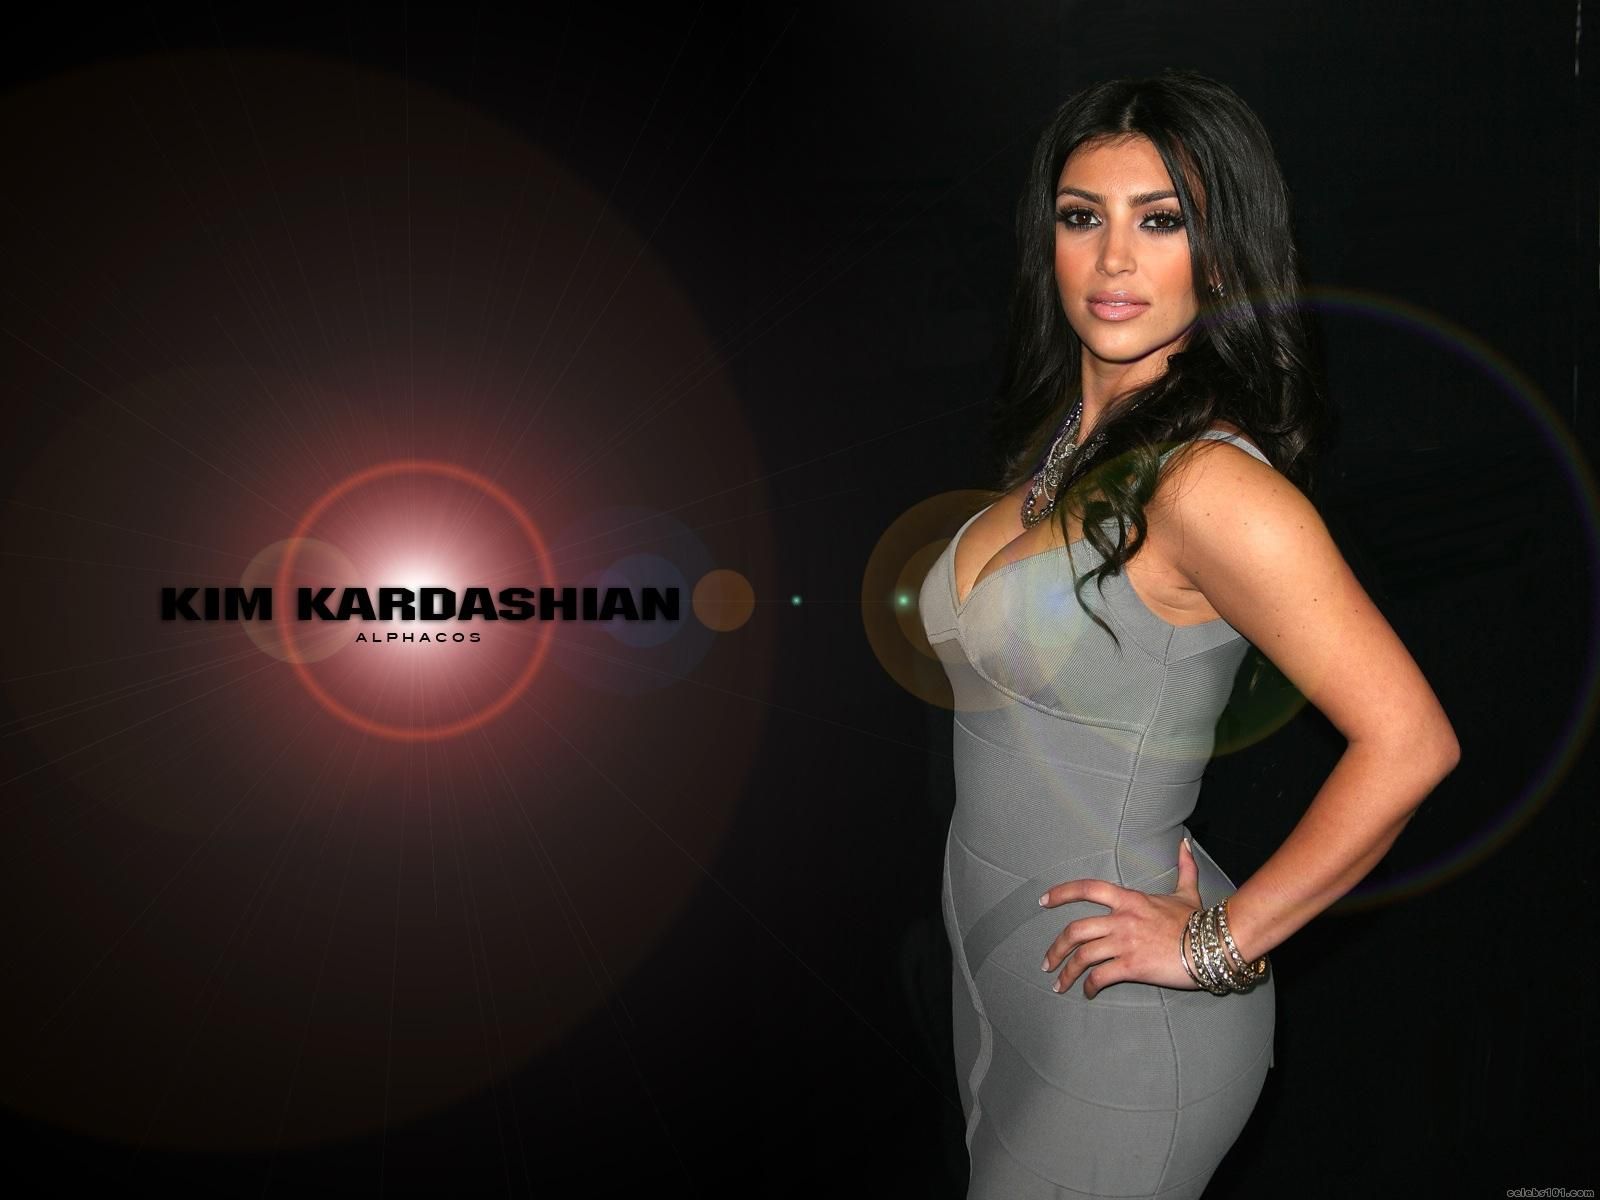 Hot Kim Kardashian HD Wallpapers Photos Galaxy   HD Wallpapers 1600x1200